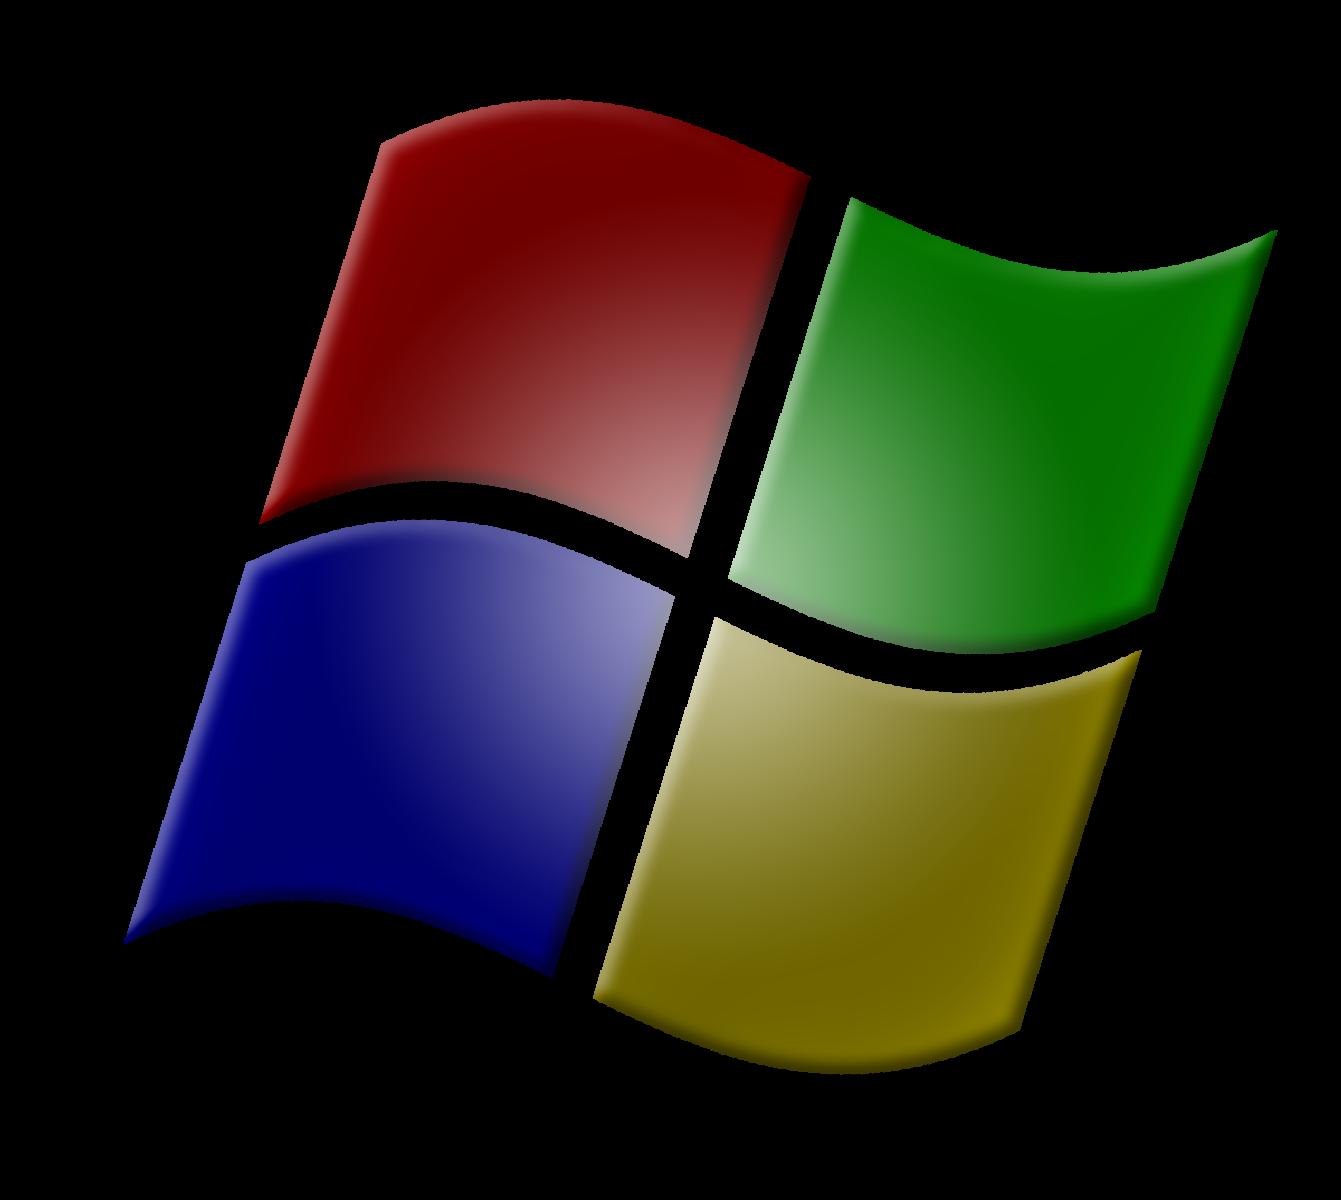 logo windows 8 black - photo #24